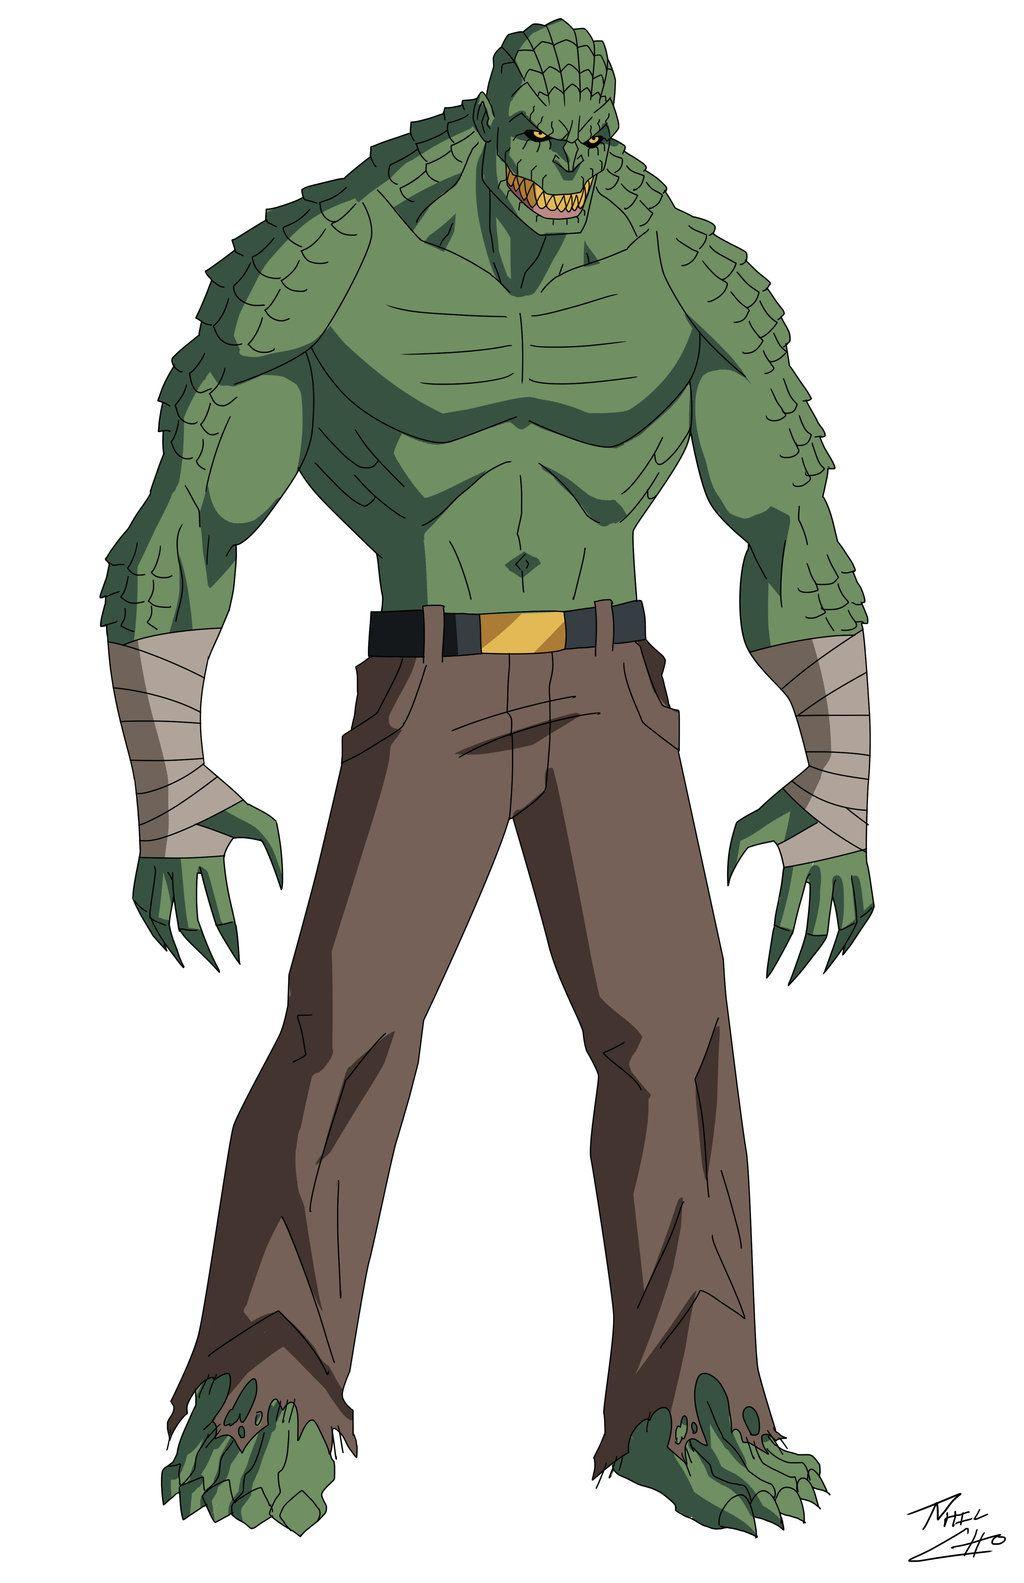 Dick crocodile animated character